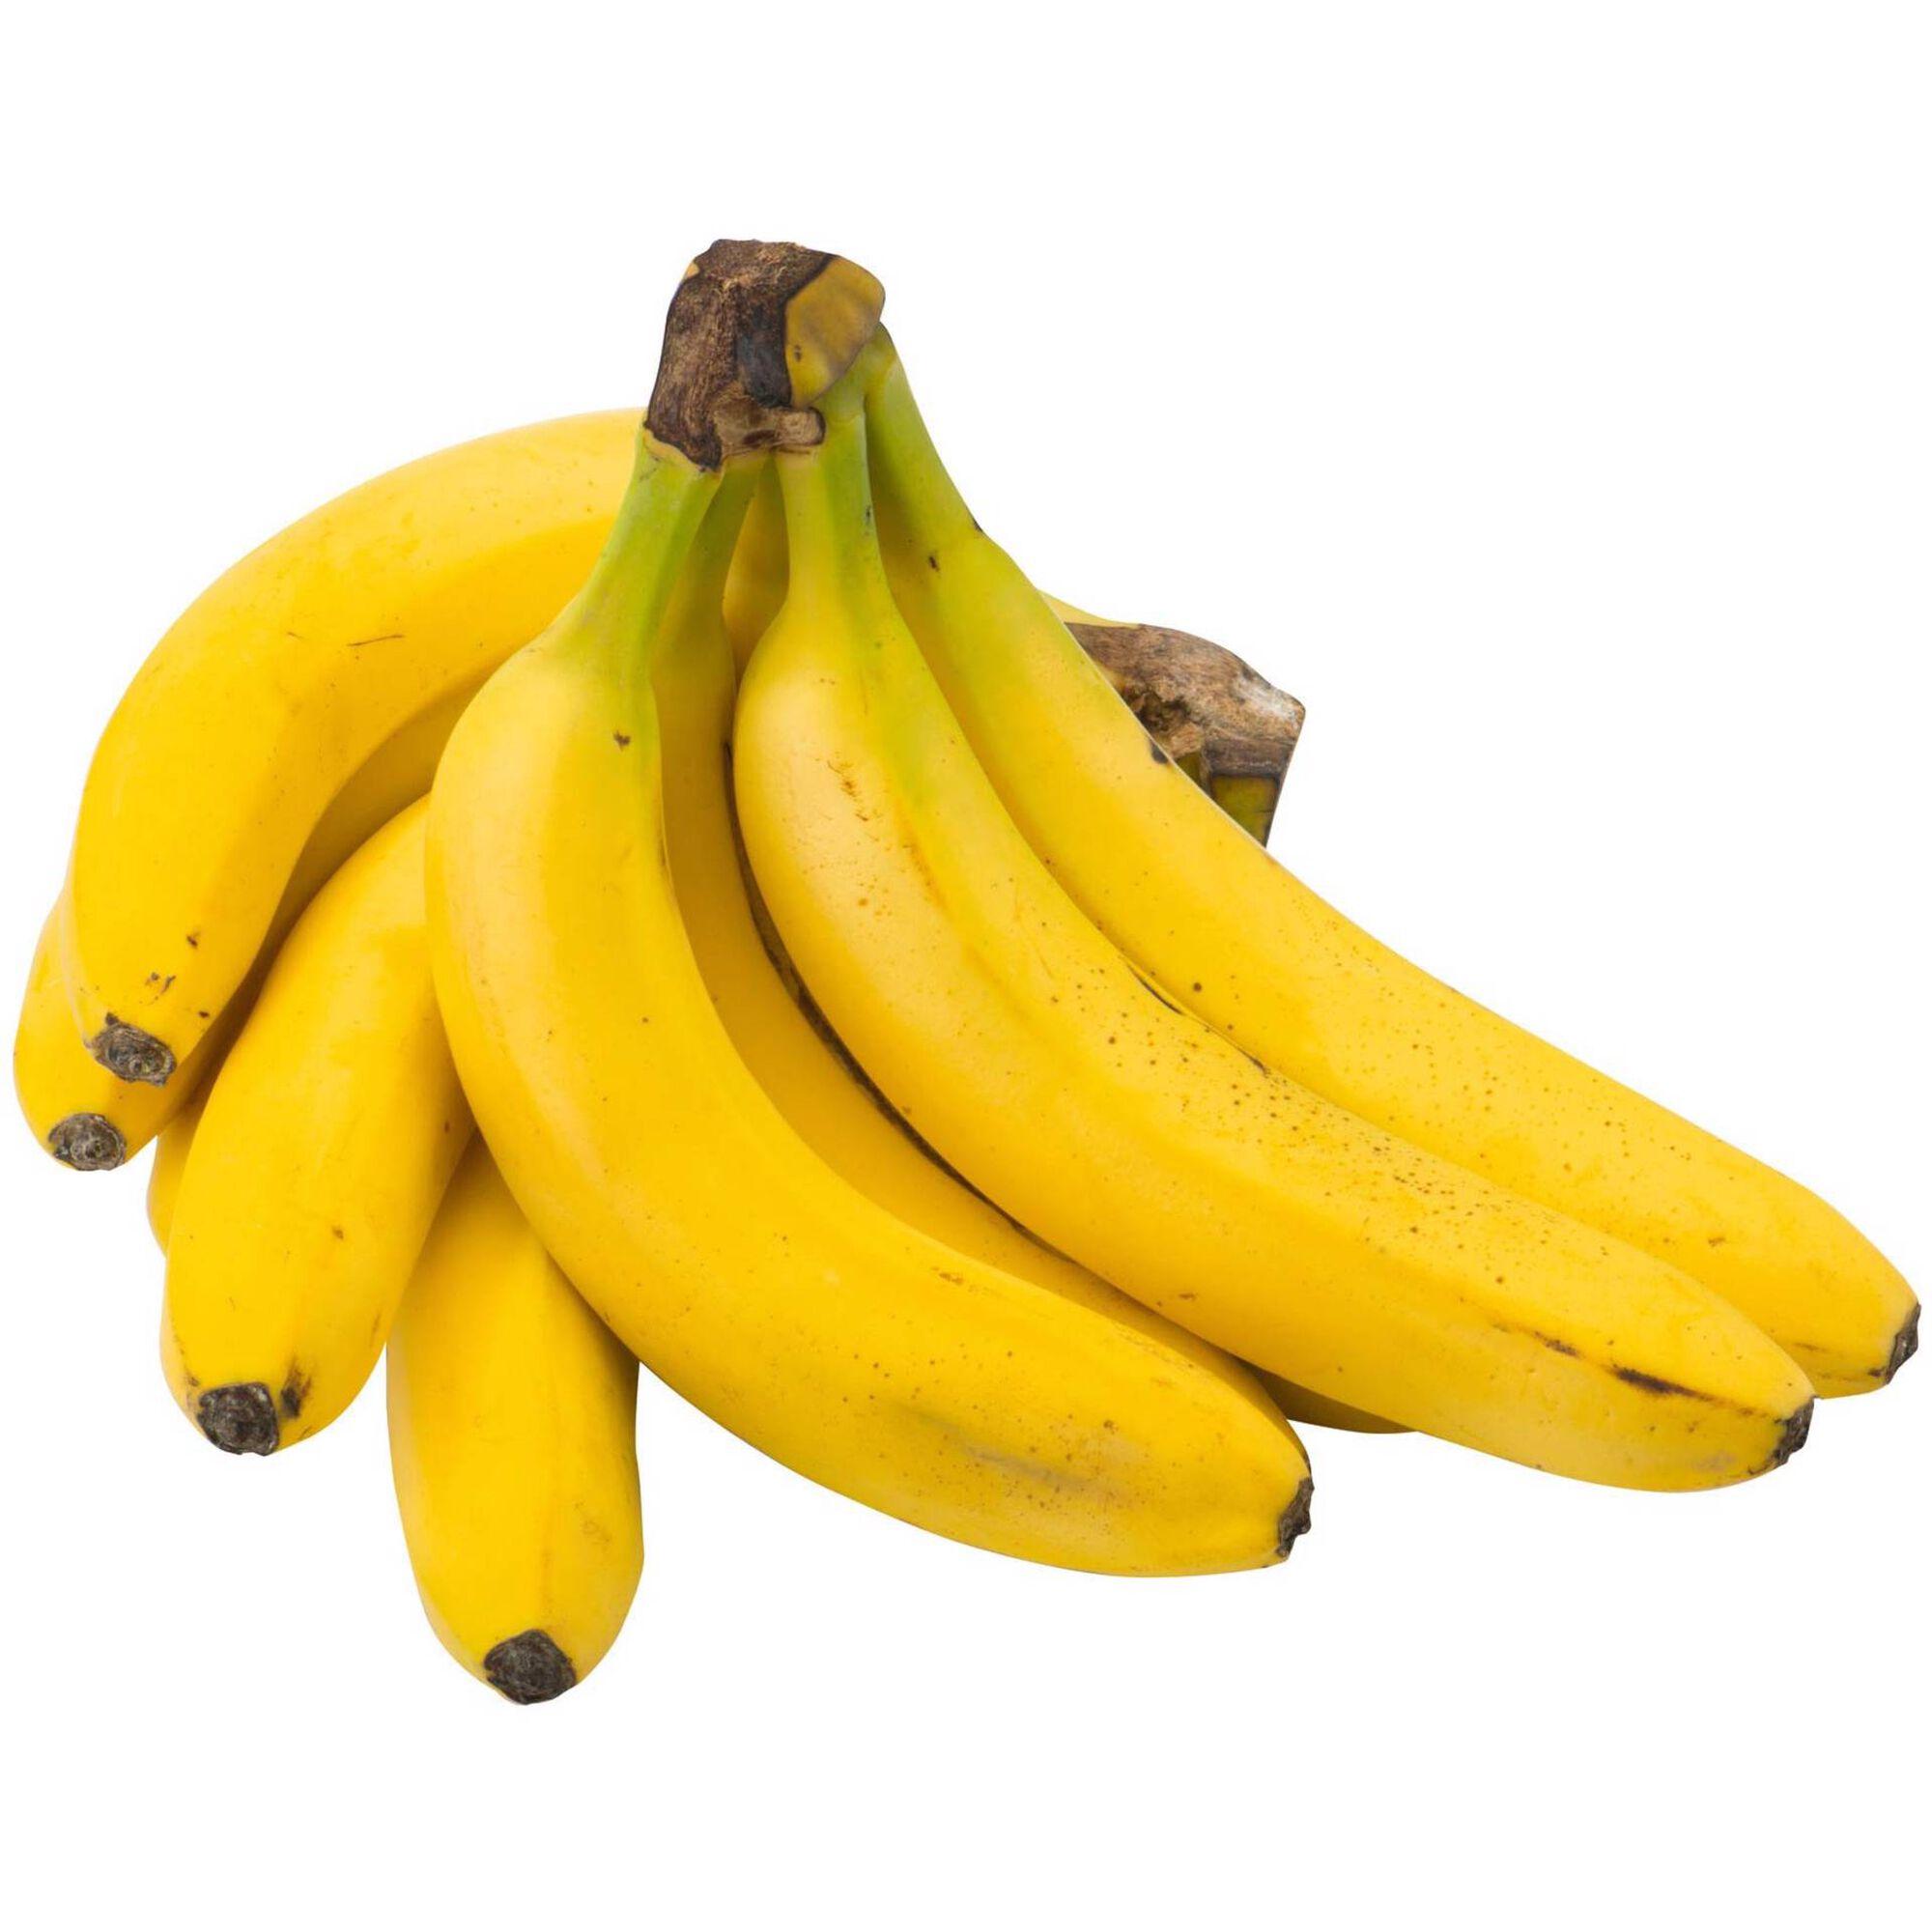 Banana Delmonte Cat.I